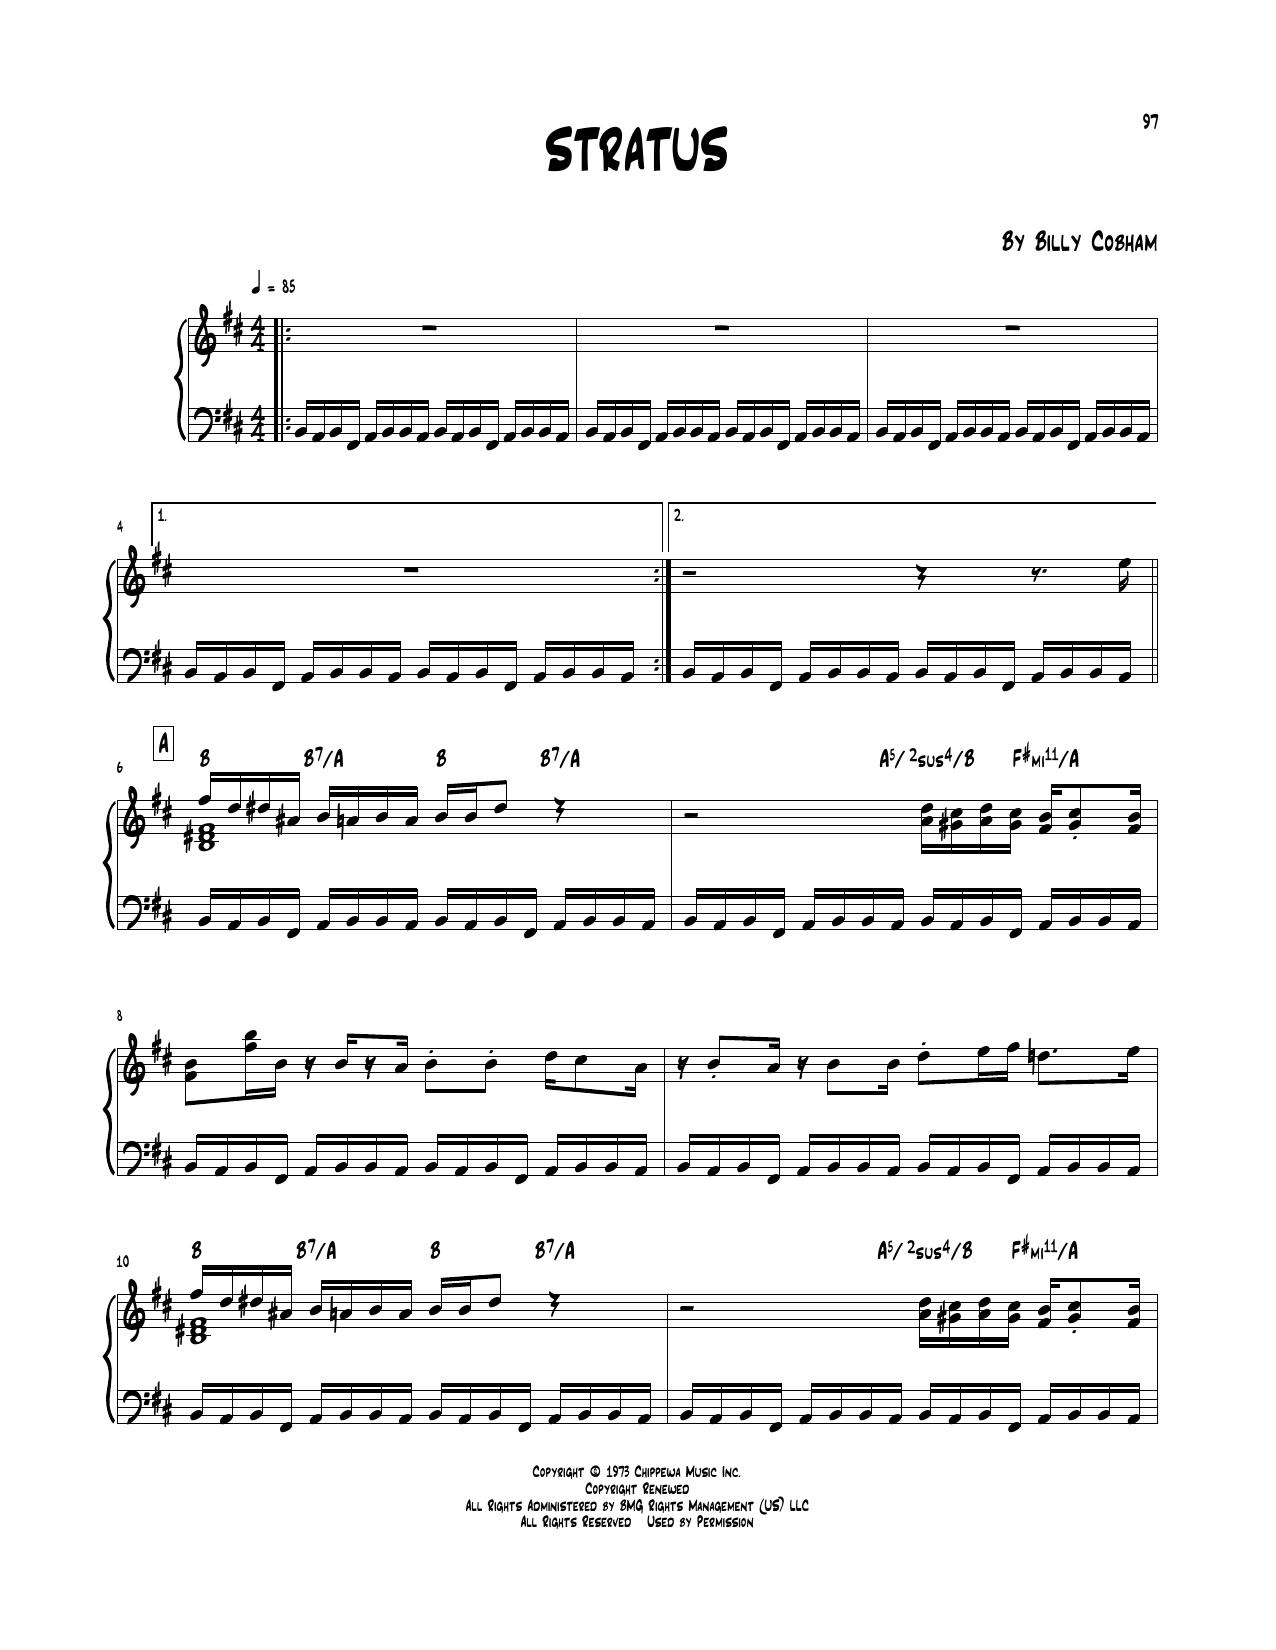 Billy Cobham 'Stratus' Sheet Music Notes, Chords   Download Printable Piano  Transcription - SKU: 252021